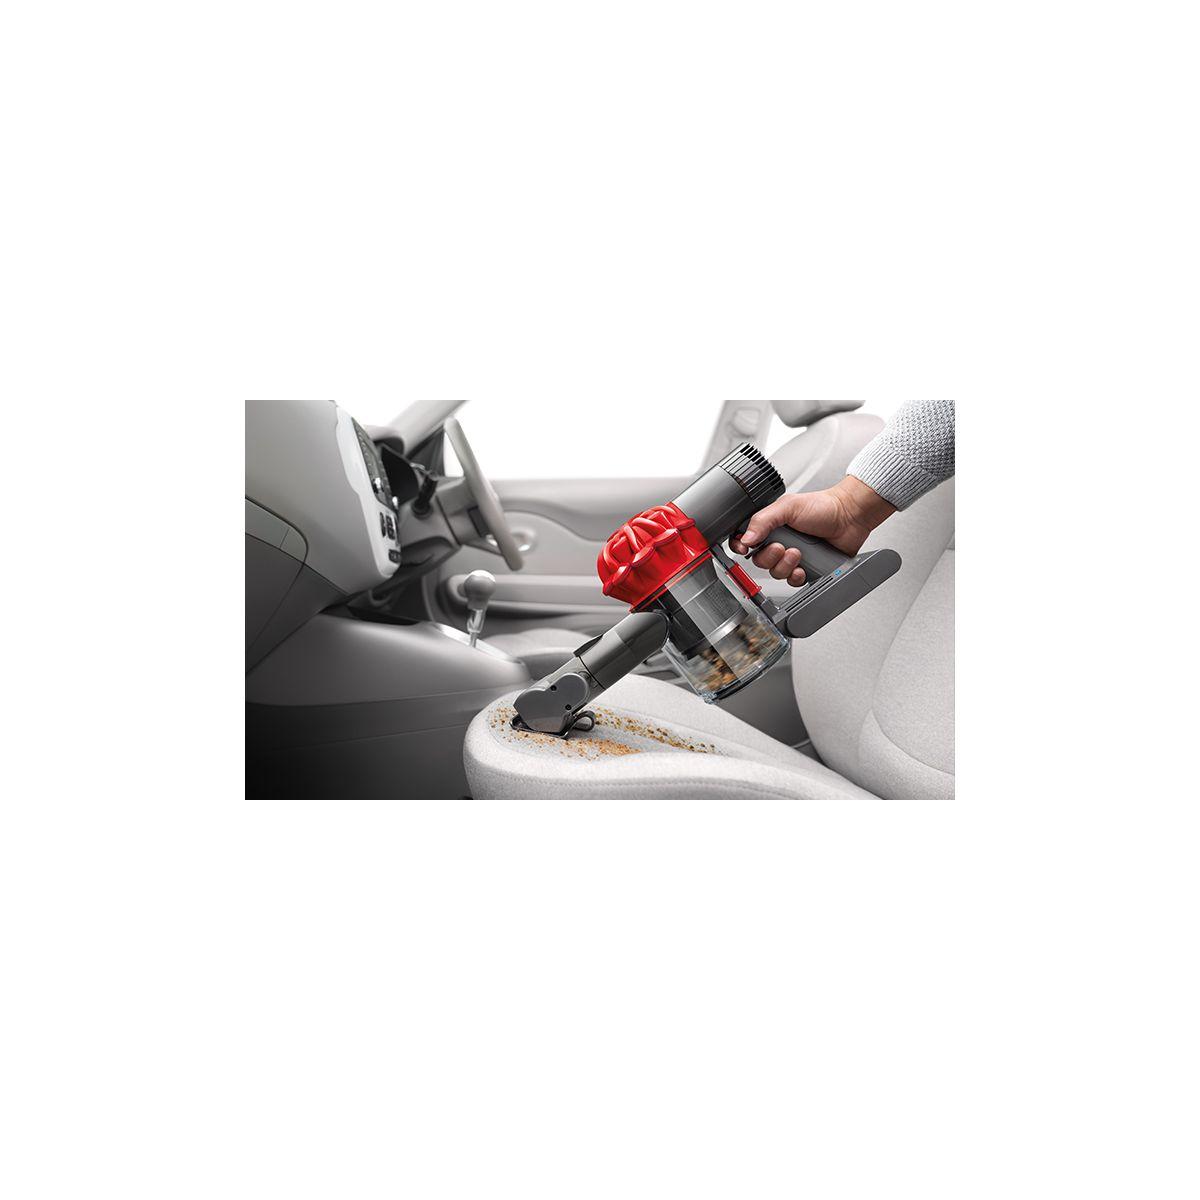 dyson dc33c pro v6 car boat pack aspirateur tra neau sans sac et main comparer avec. Black Bedroom Furniture Sets. Home Design Ideas